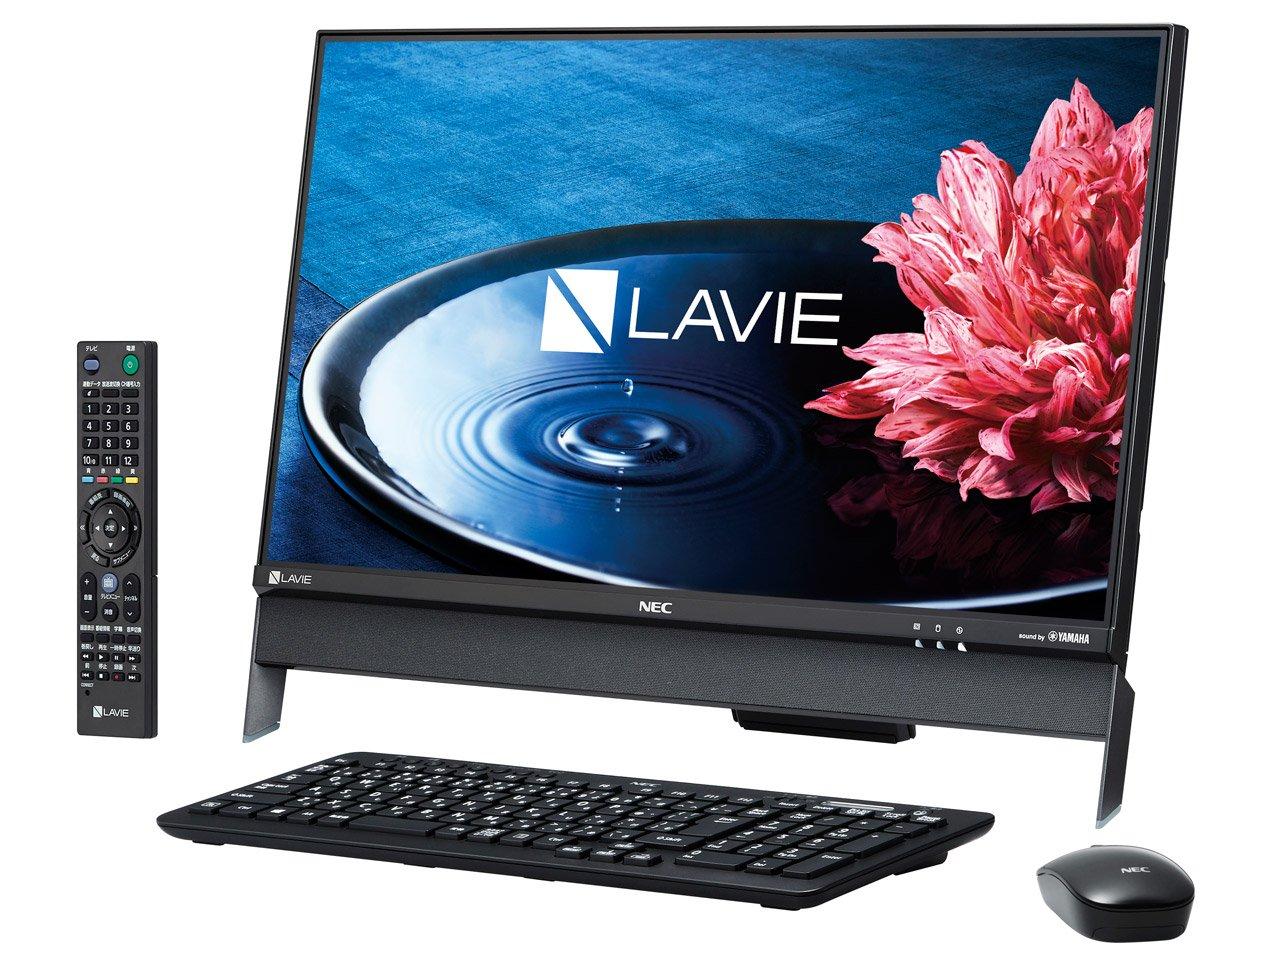 【NEW限定品】 NEC LAVIE PC-DA370EAB All-in-one LAVIE Desk All-in-one B01FFGW3S0 B01FFGW3S0, Kunio Collection:0f268841 --- martinemoeykens.com